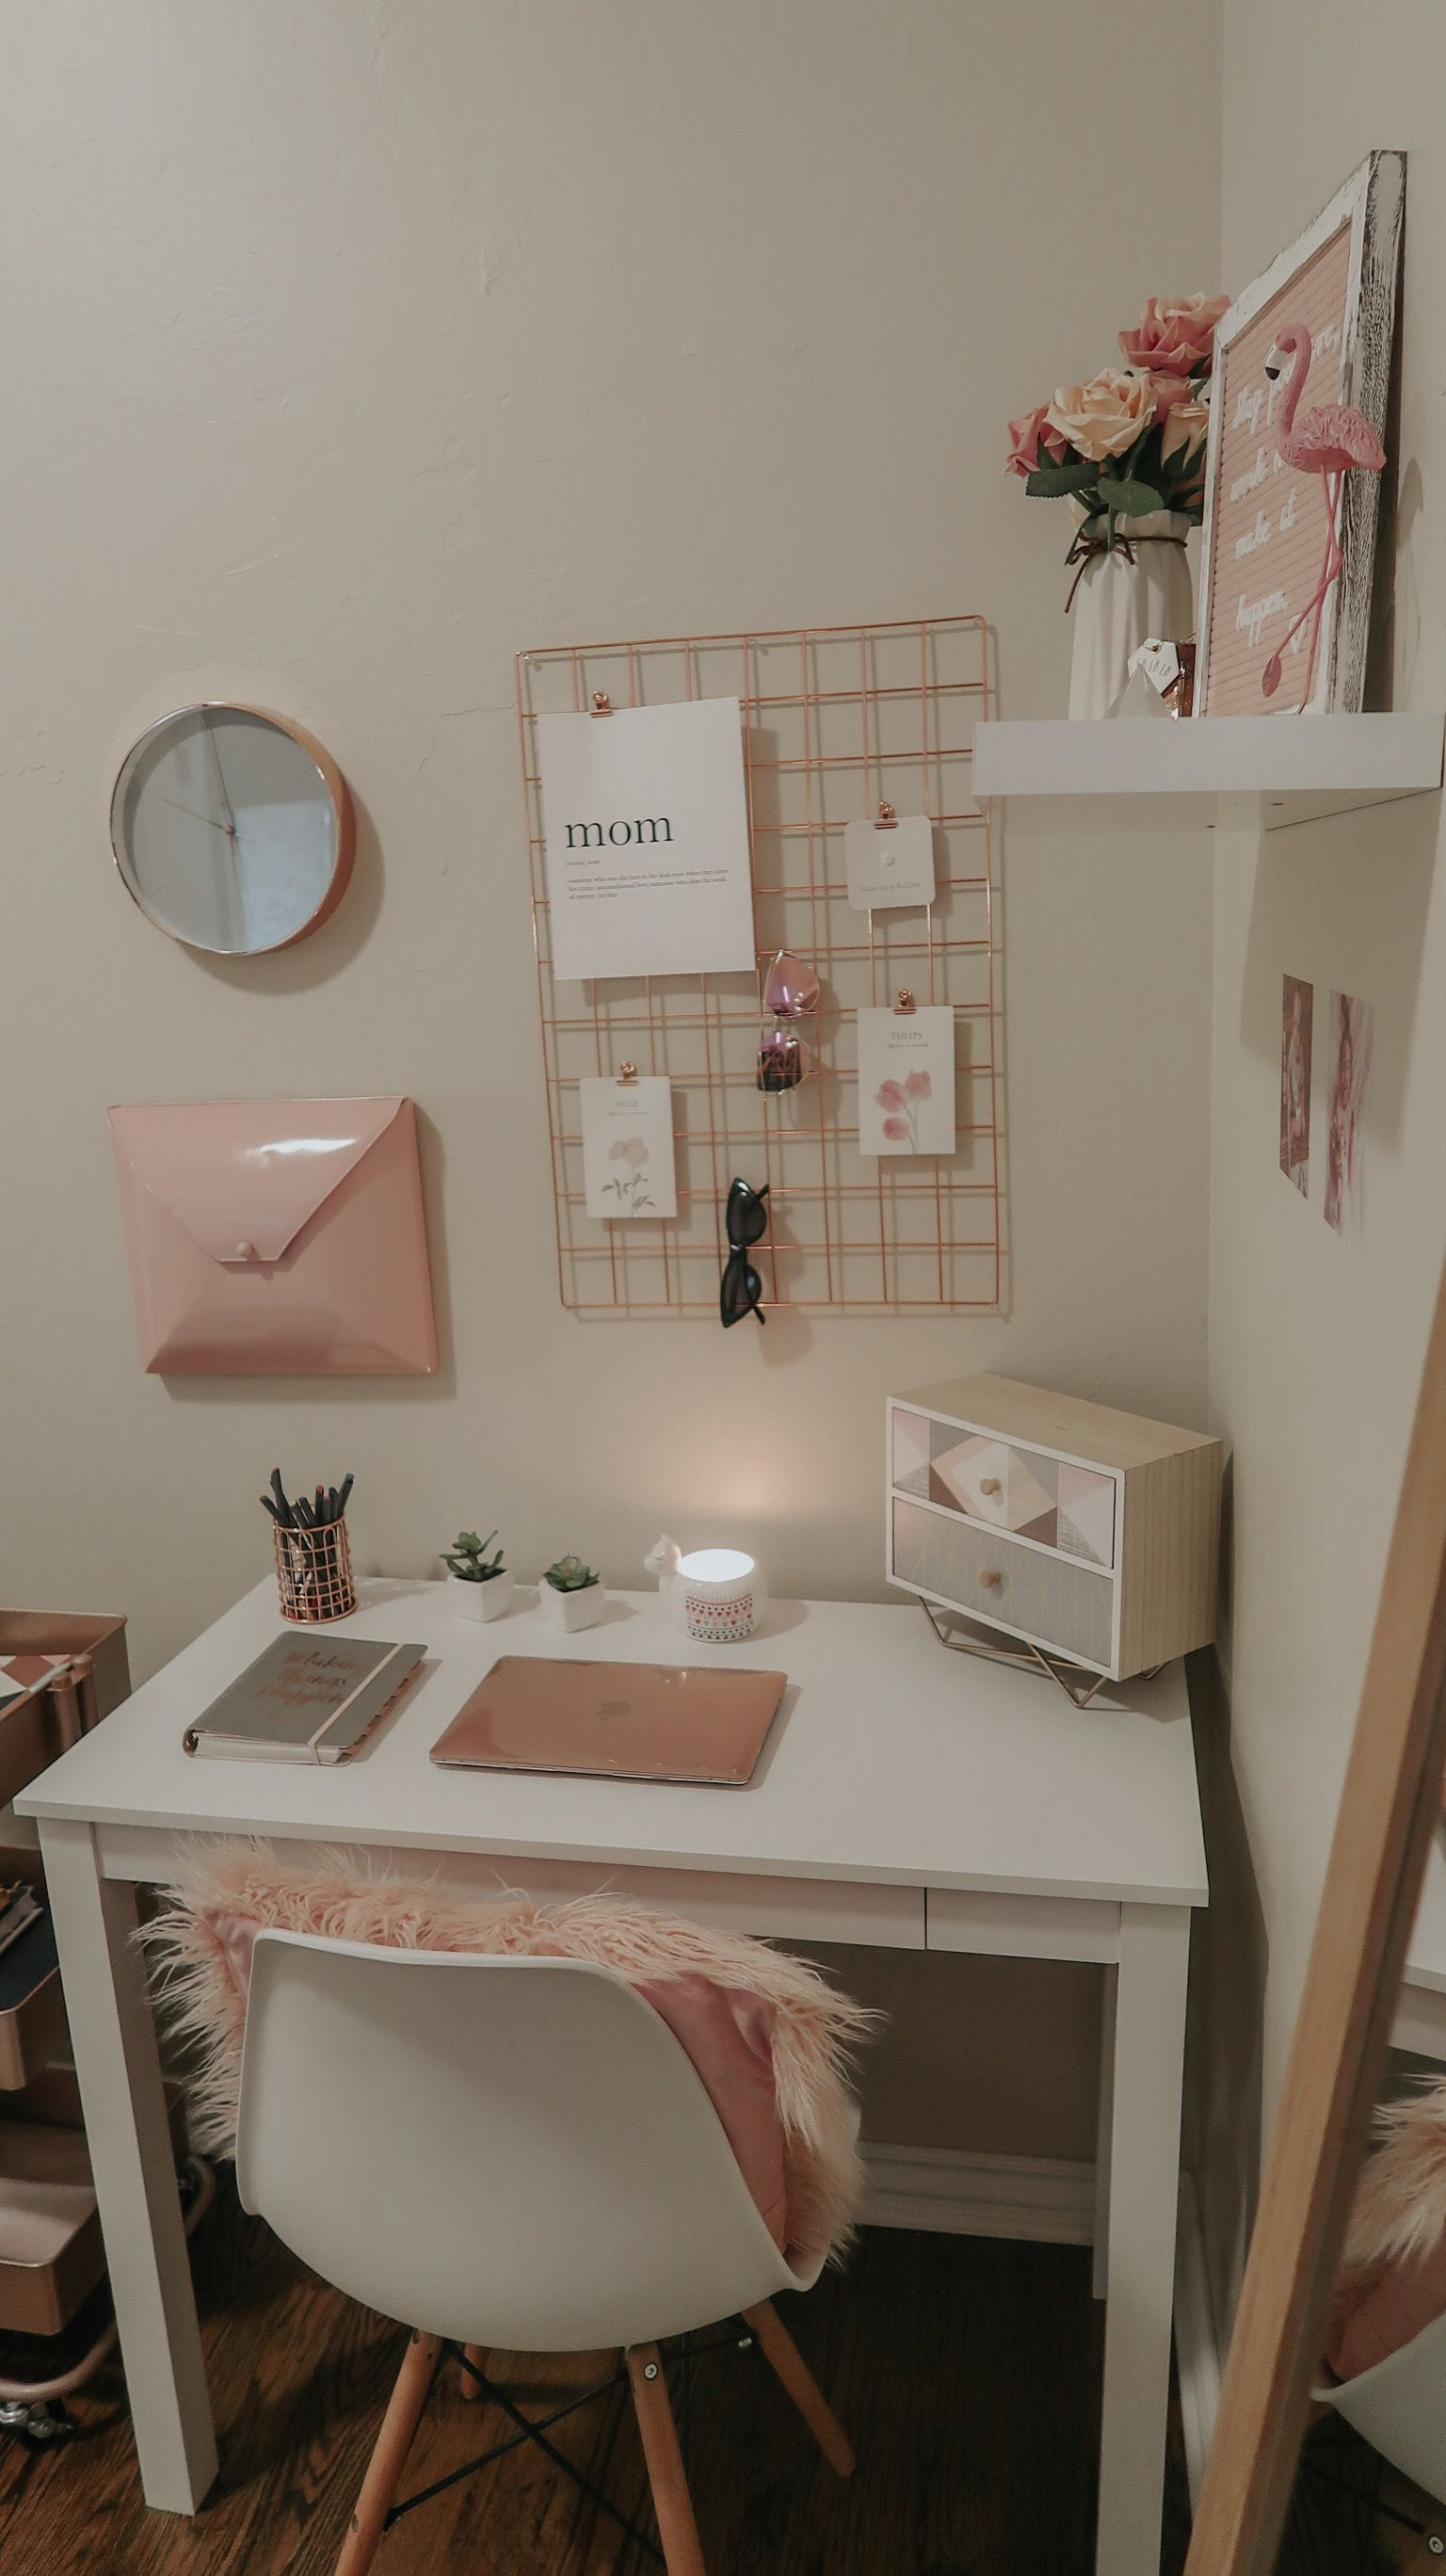 Remorseles: Aesthetic Diy Room Decor Tumblr